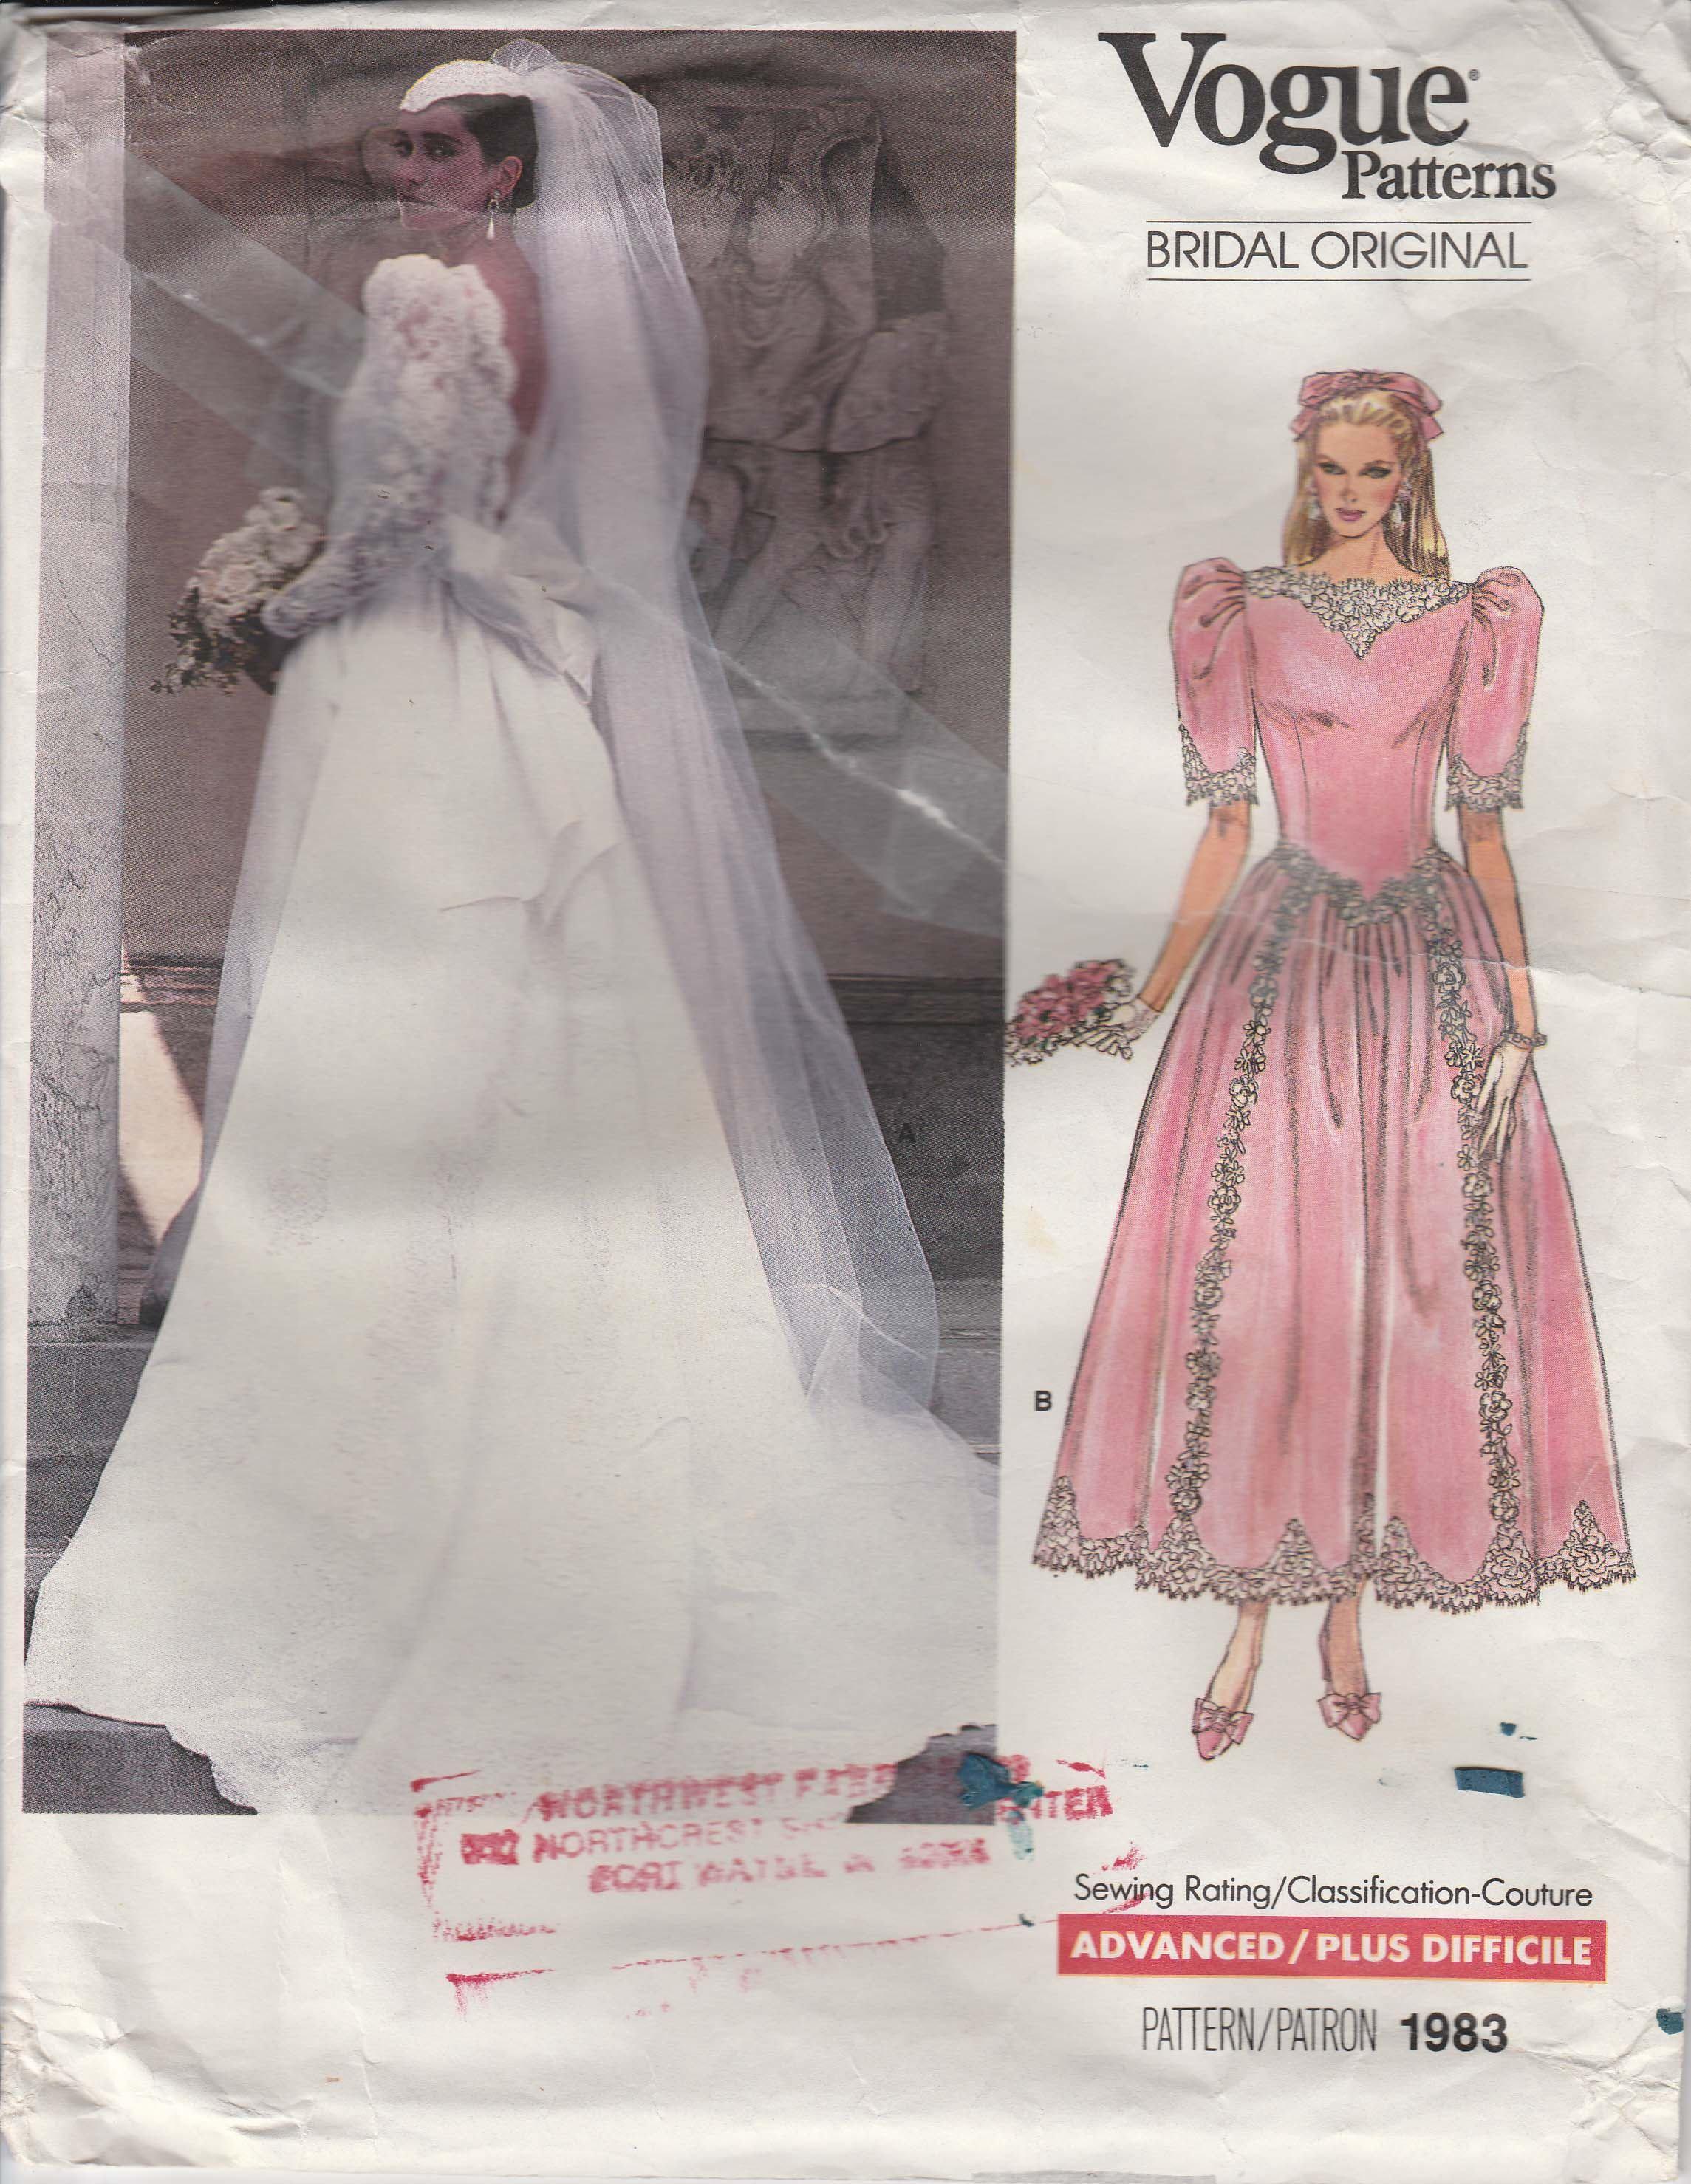 Wedding Dress Pattern 1980s Lace Backless Misses Size 8 1980s Vogue 1983 Bridal Origina Classic Wedding Dress Wedding Dresses Unique Wedding Dresses Strapless [ 2957 x 2289 Pixel ]